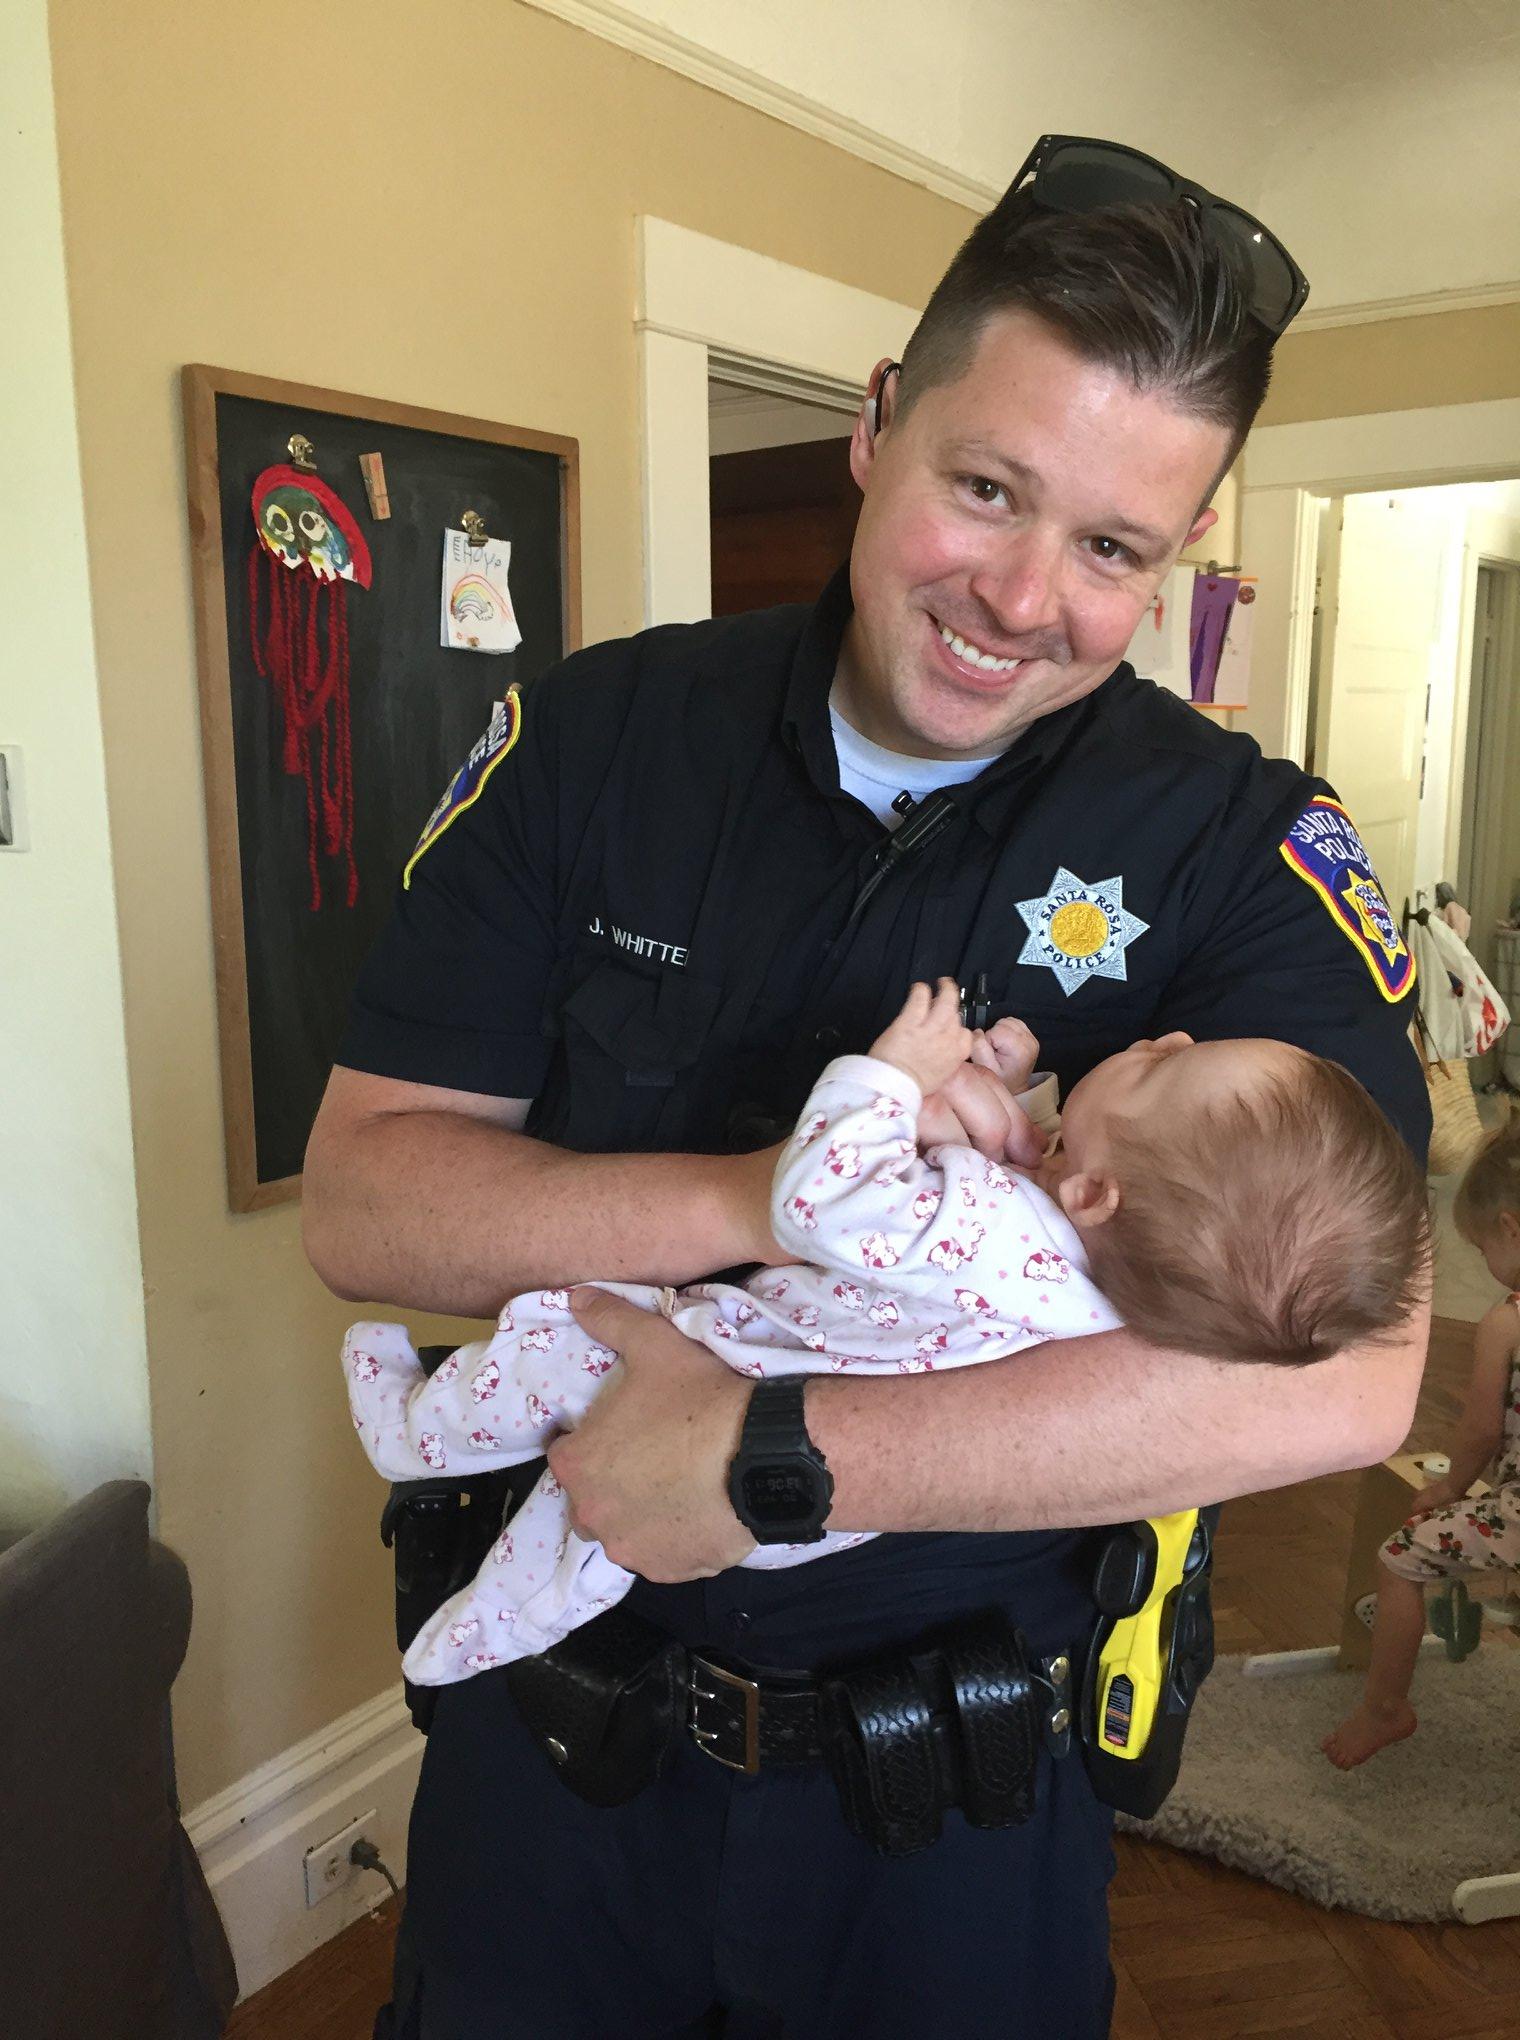 California Officer Adopts Baby of Homeless Woman Battling Drug Addiction